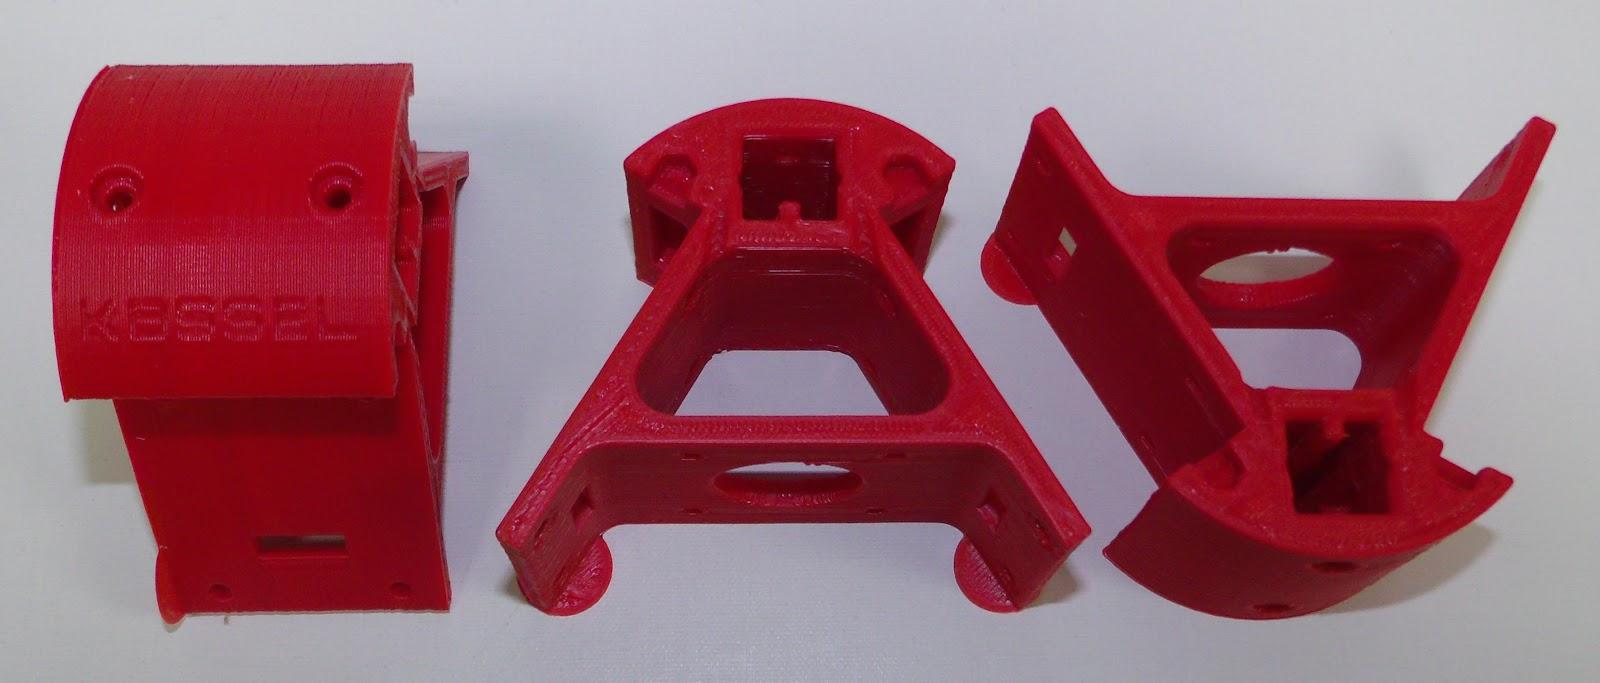 02-motor-brackets.jpg